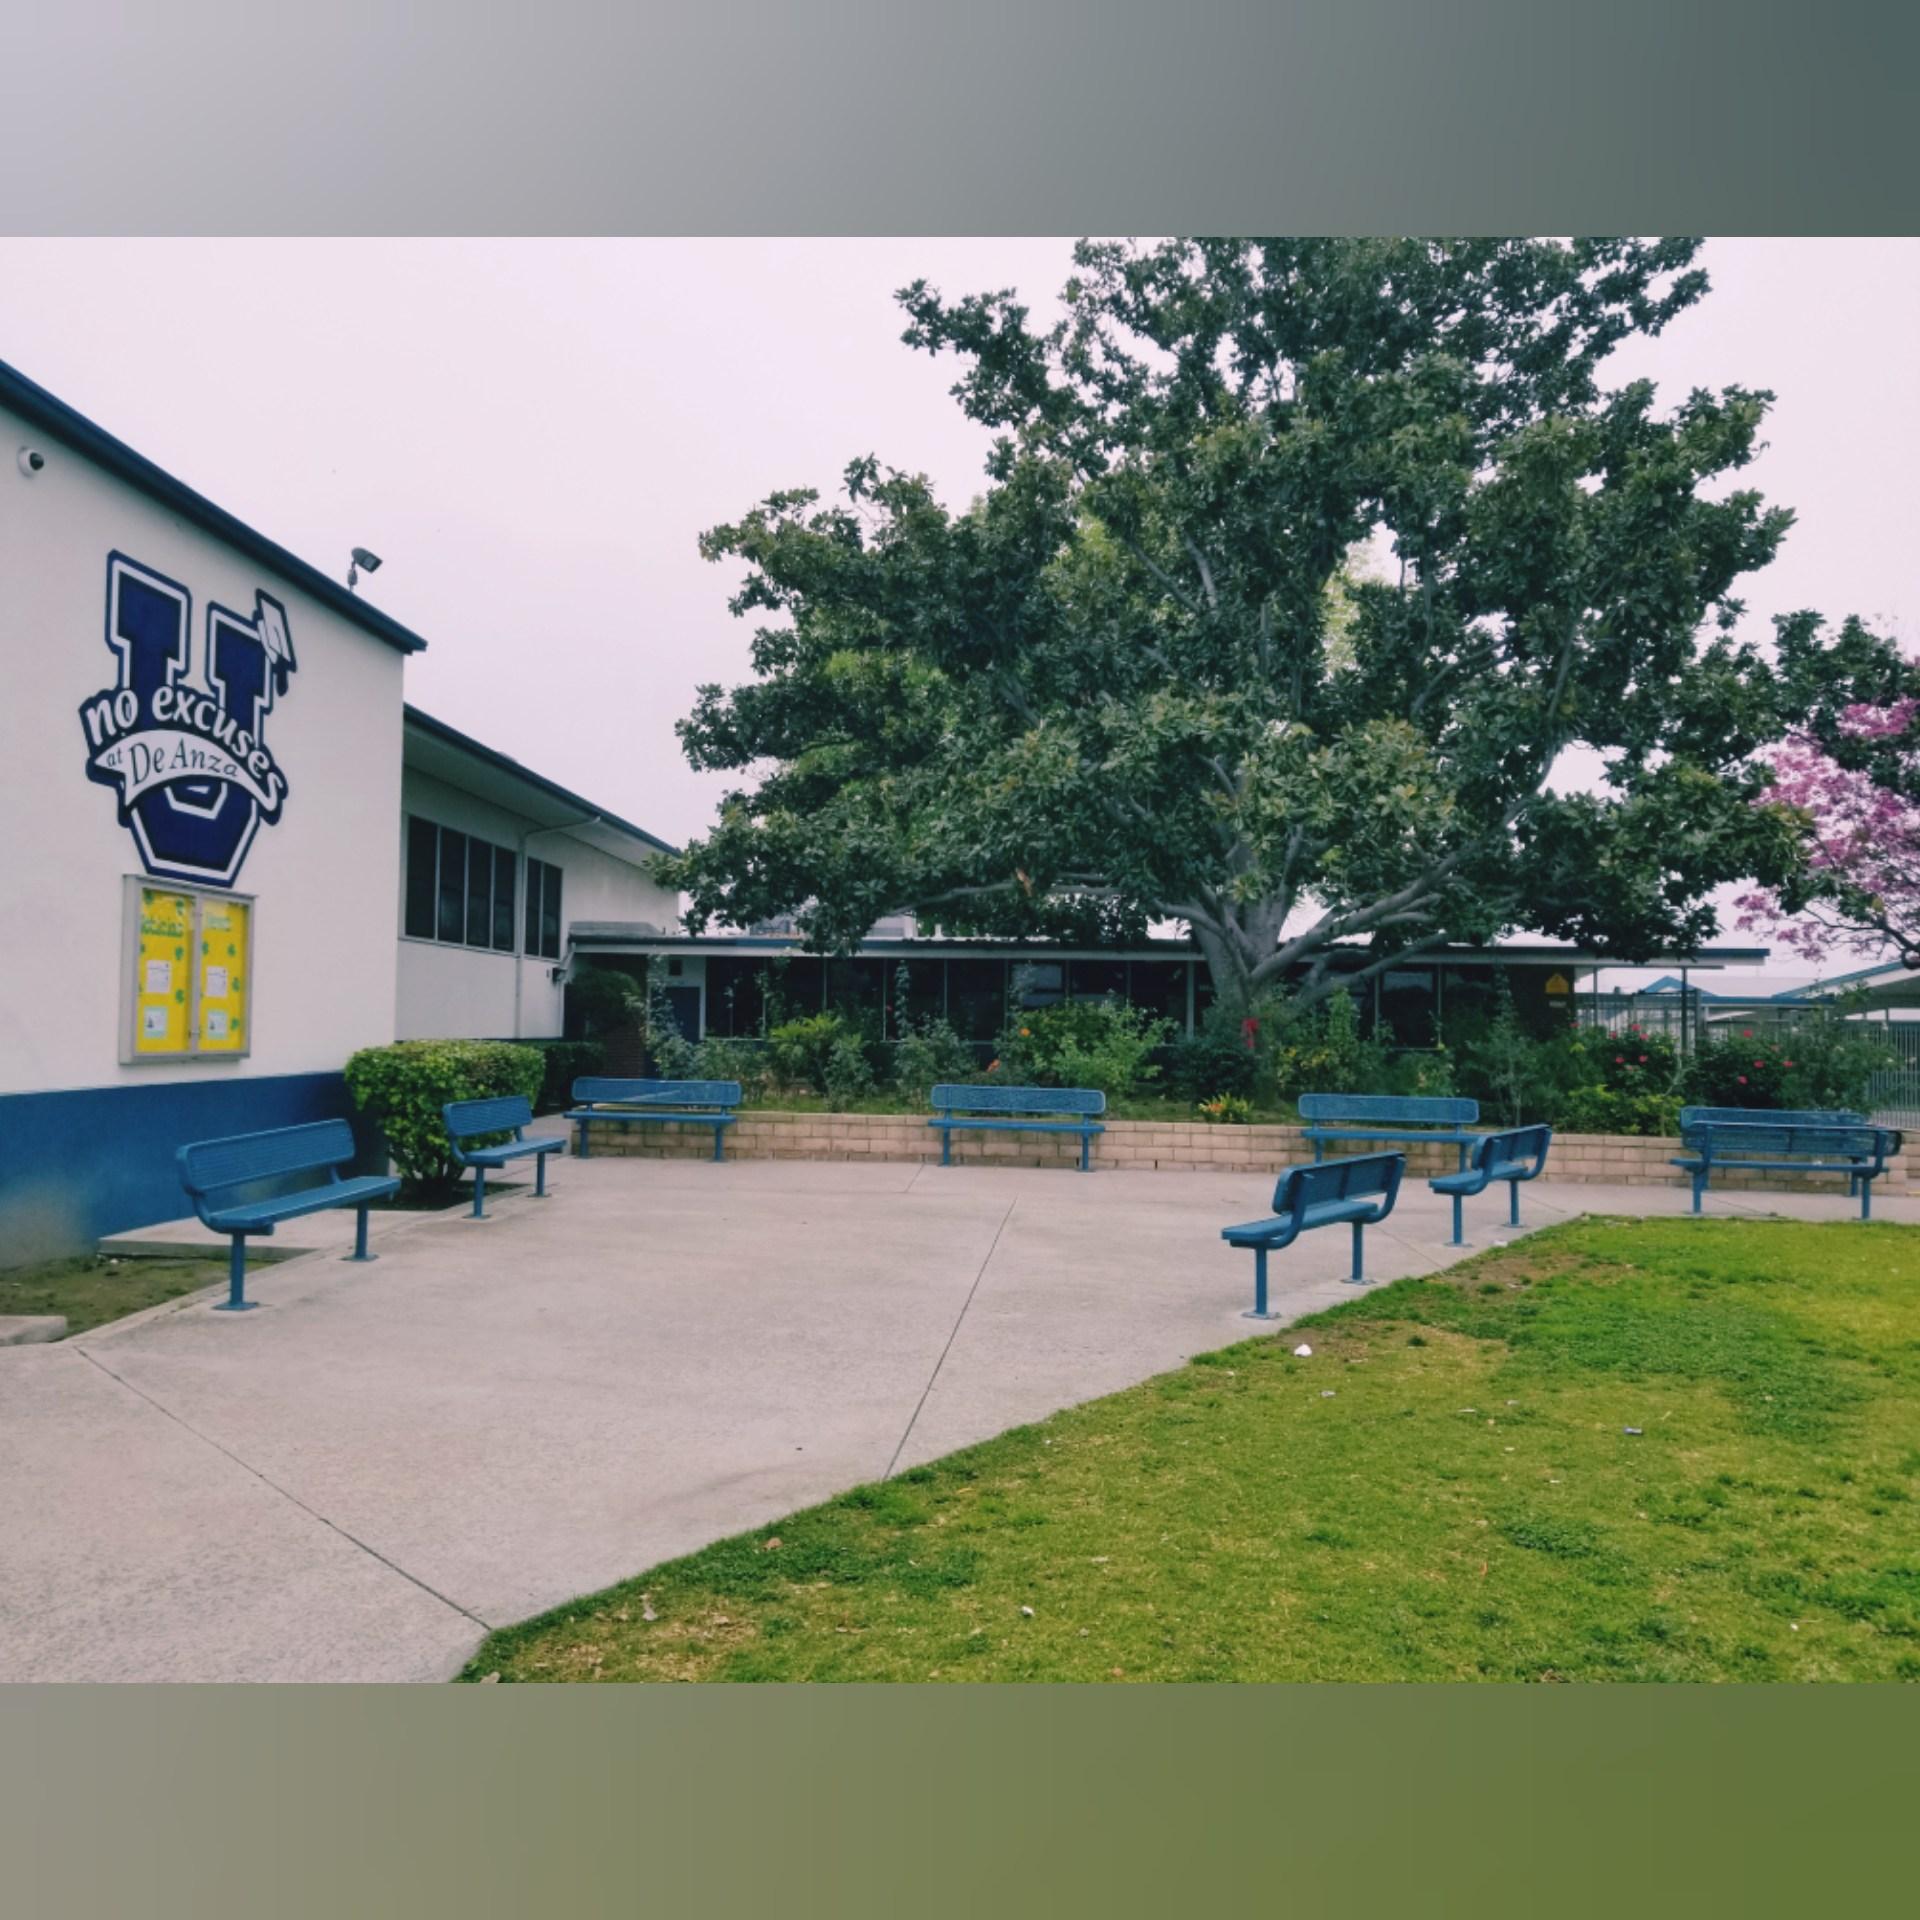 De Anza Elementary School